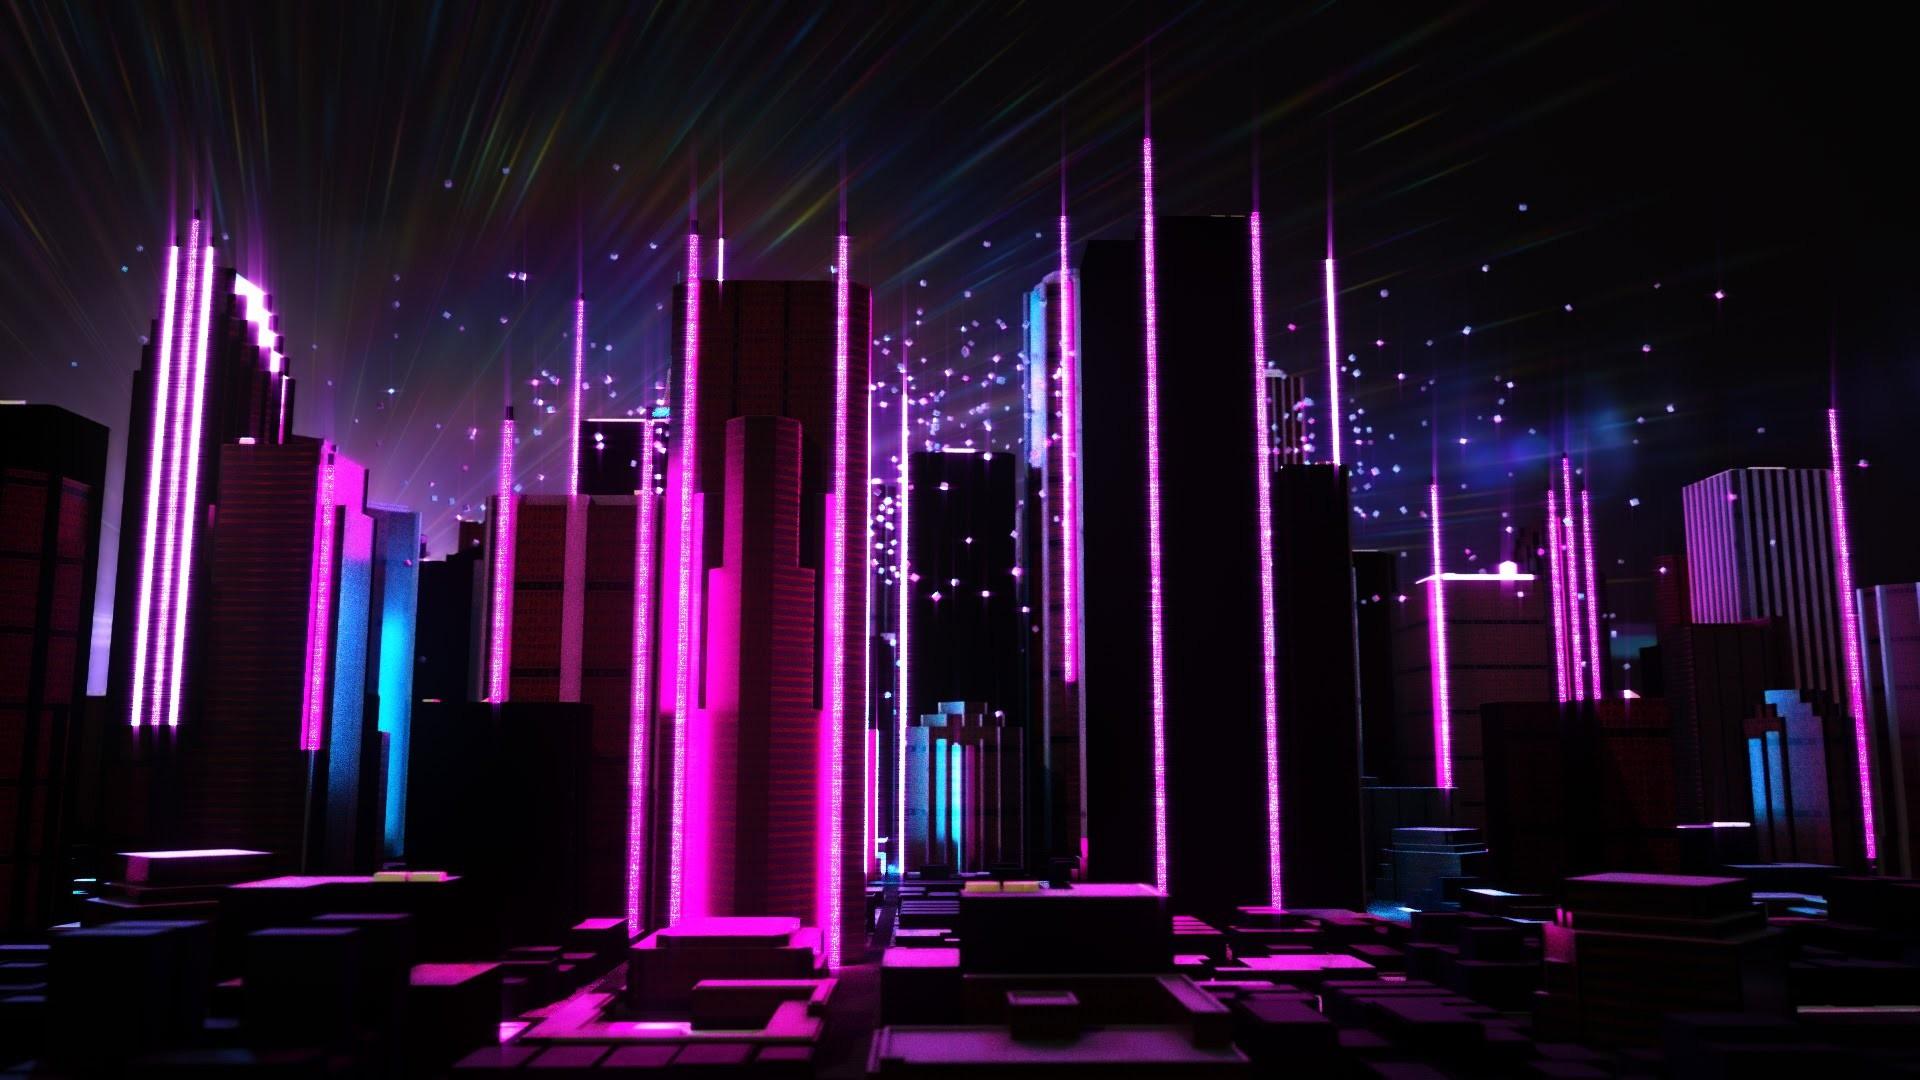 General 1920x1080 retrowave Retrowave purple purple background pink vaporwave abstract stars